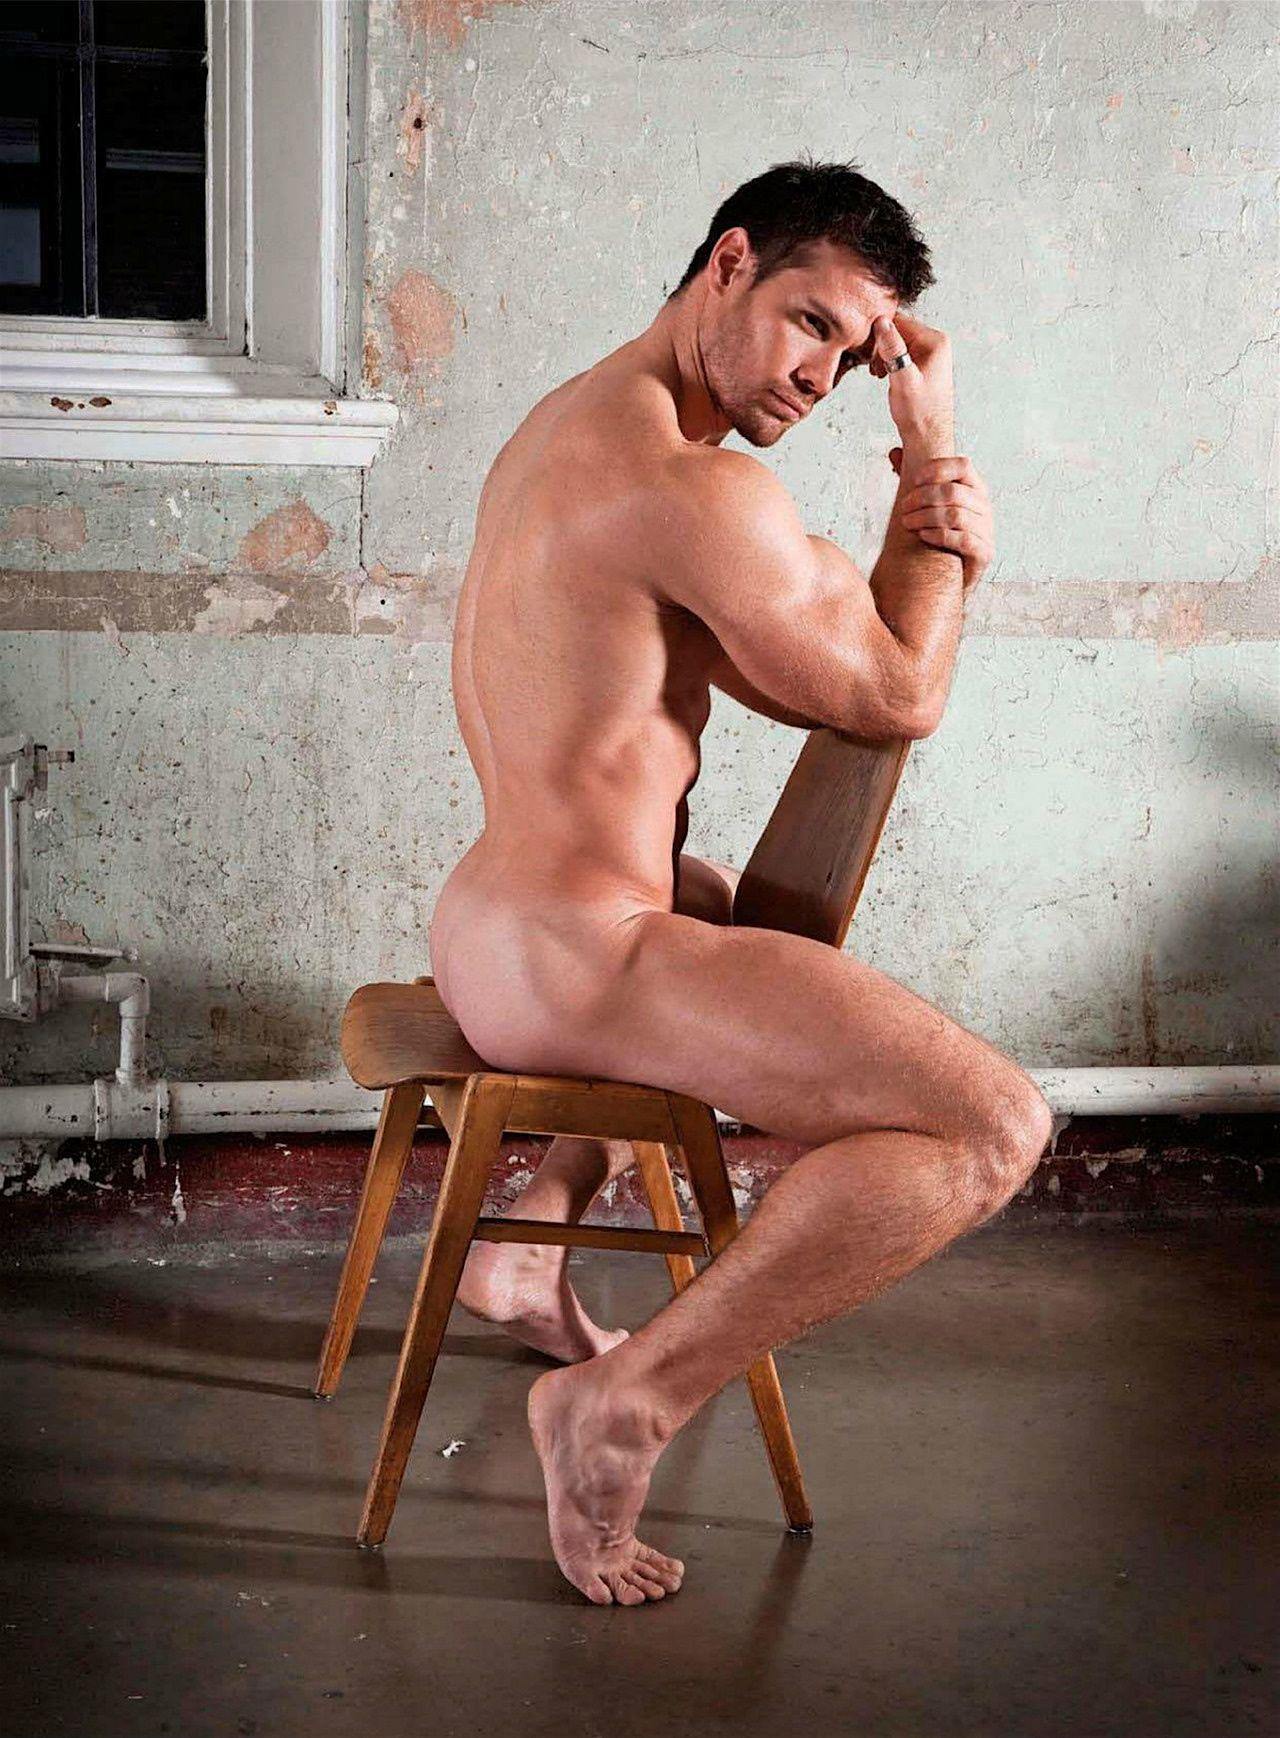 Nude male freshmen magazine models, sexy country girlz nakd